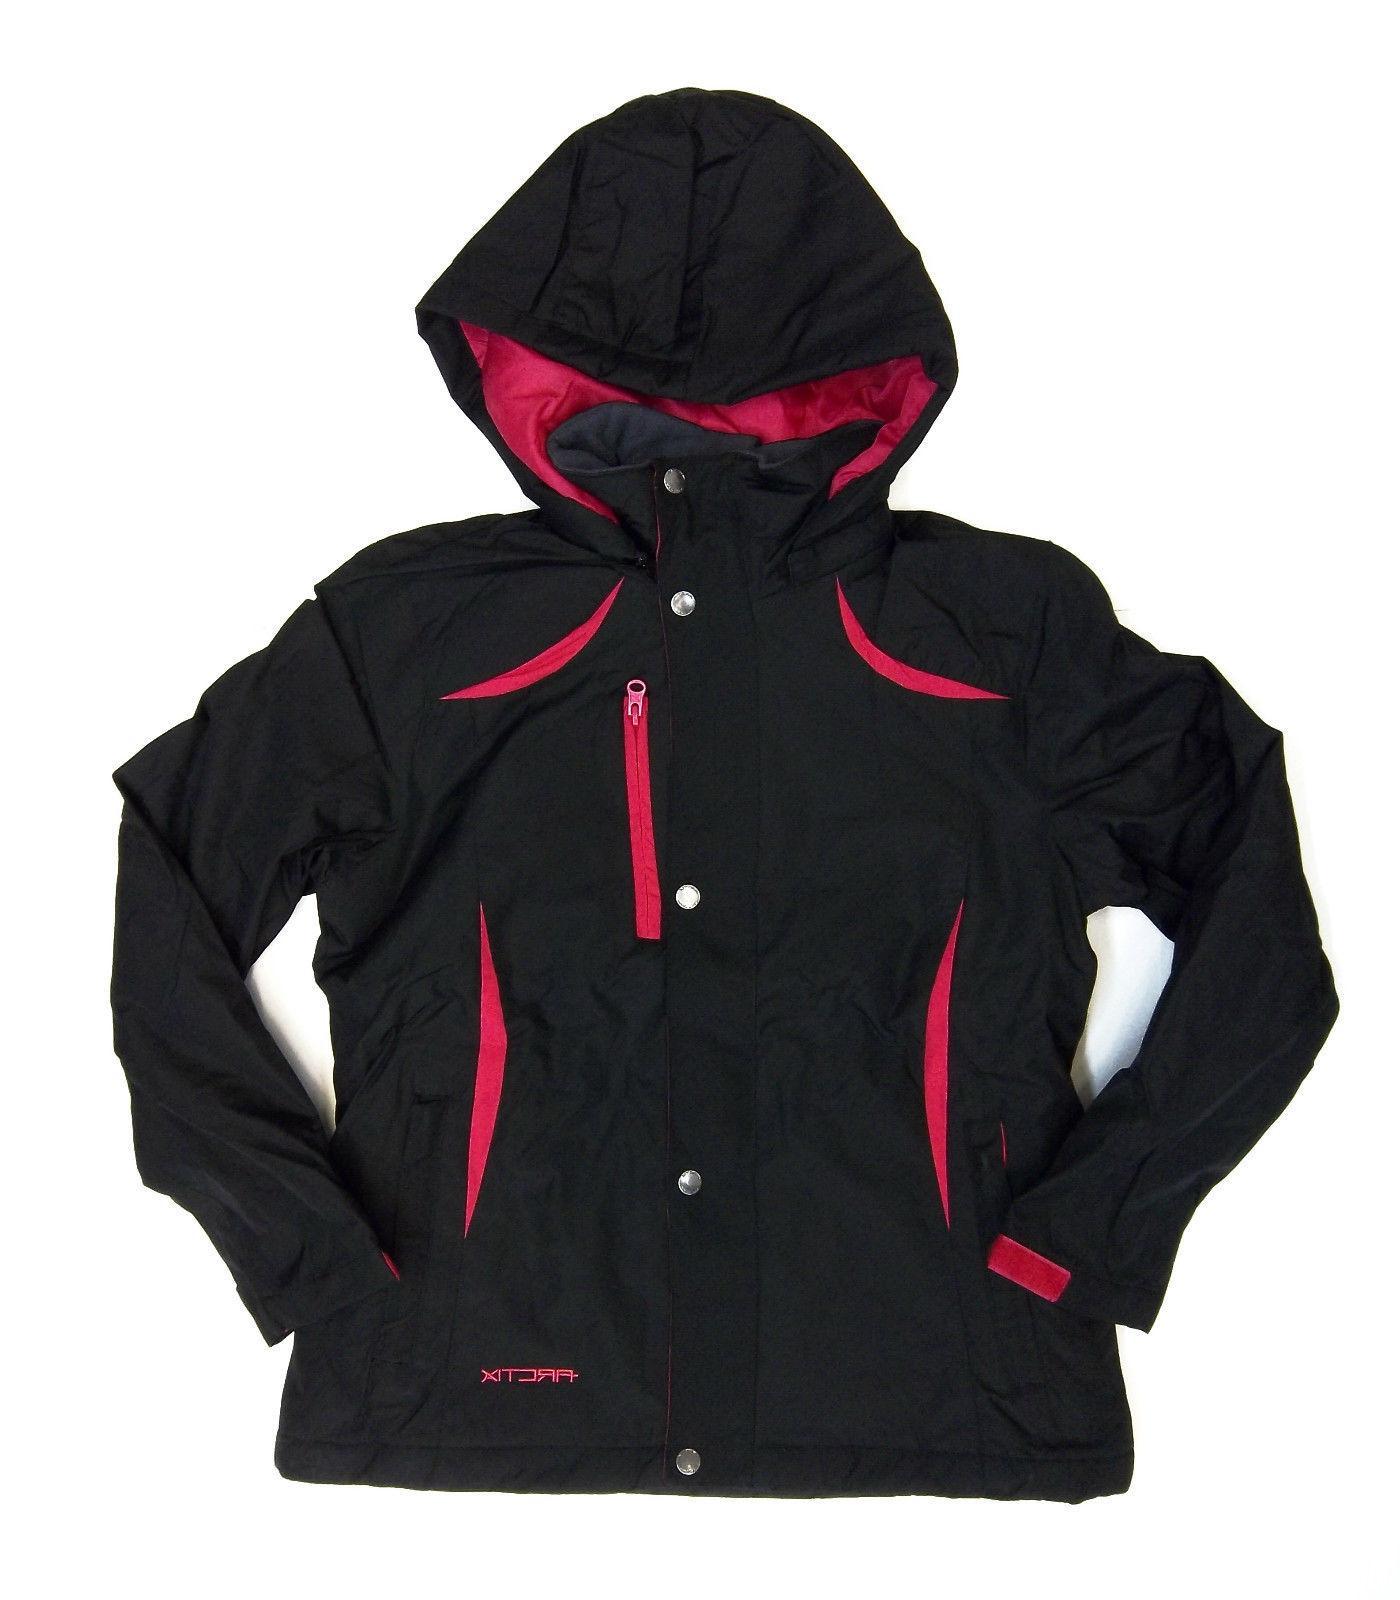 Arctix Women's Glacier Ski Jacket 62710-00 Black